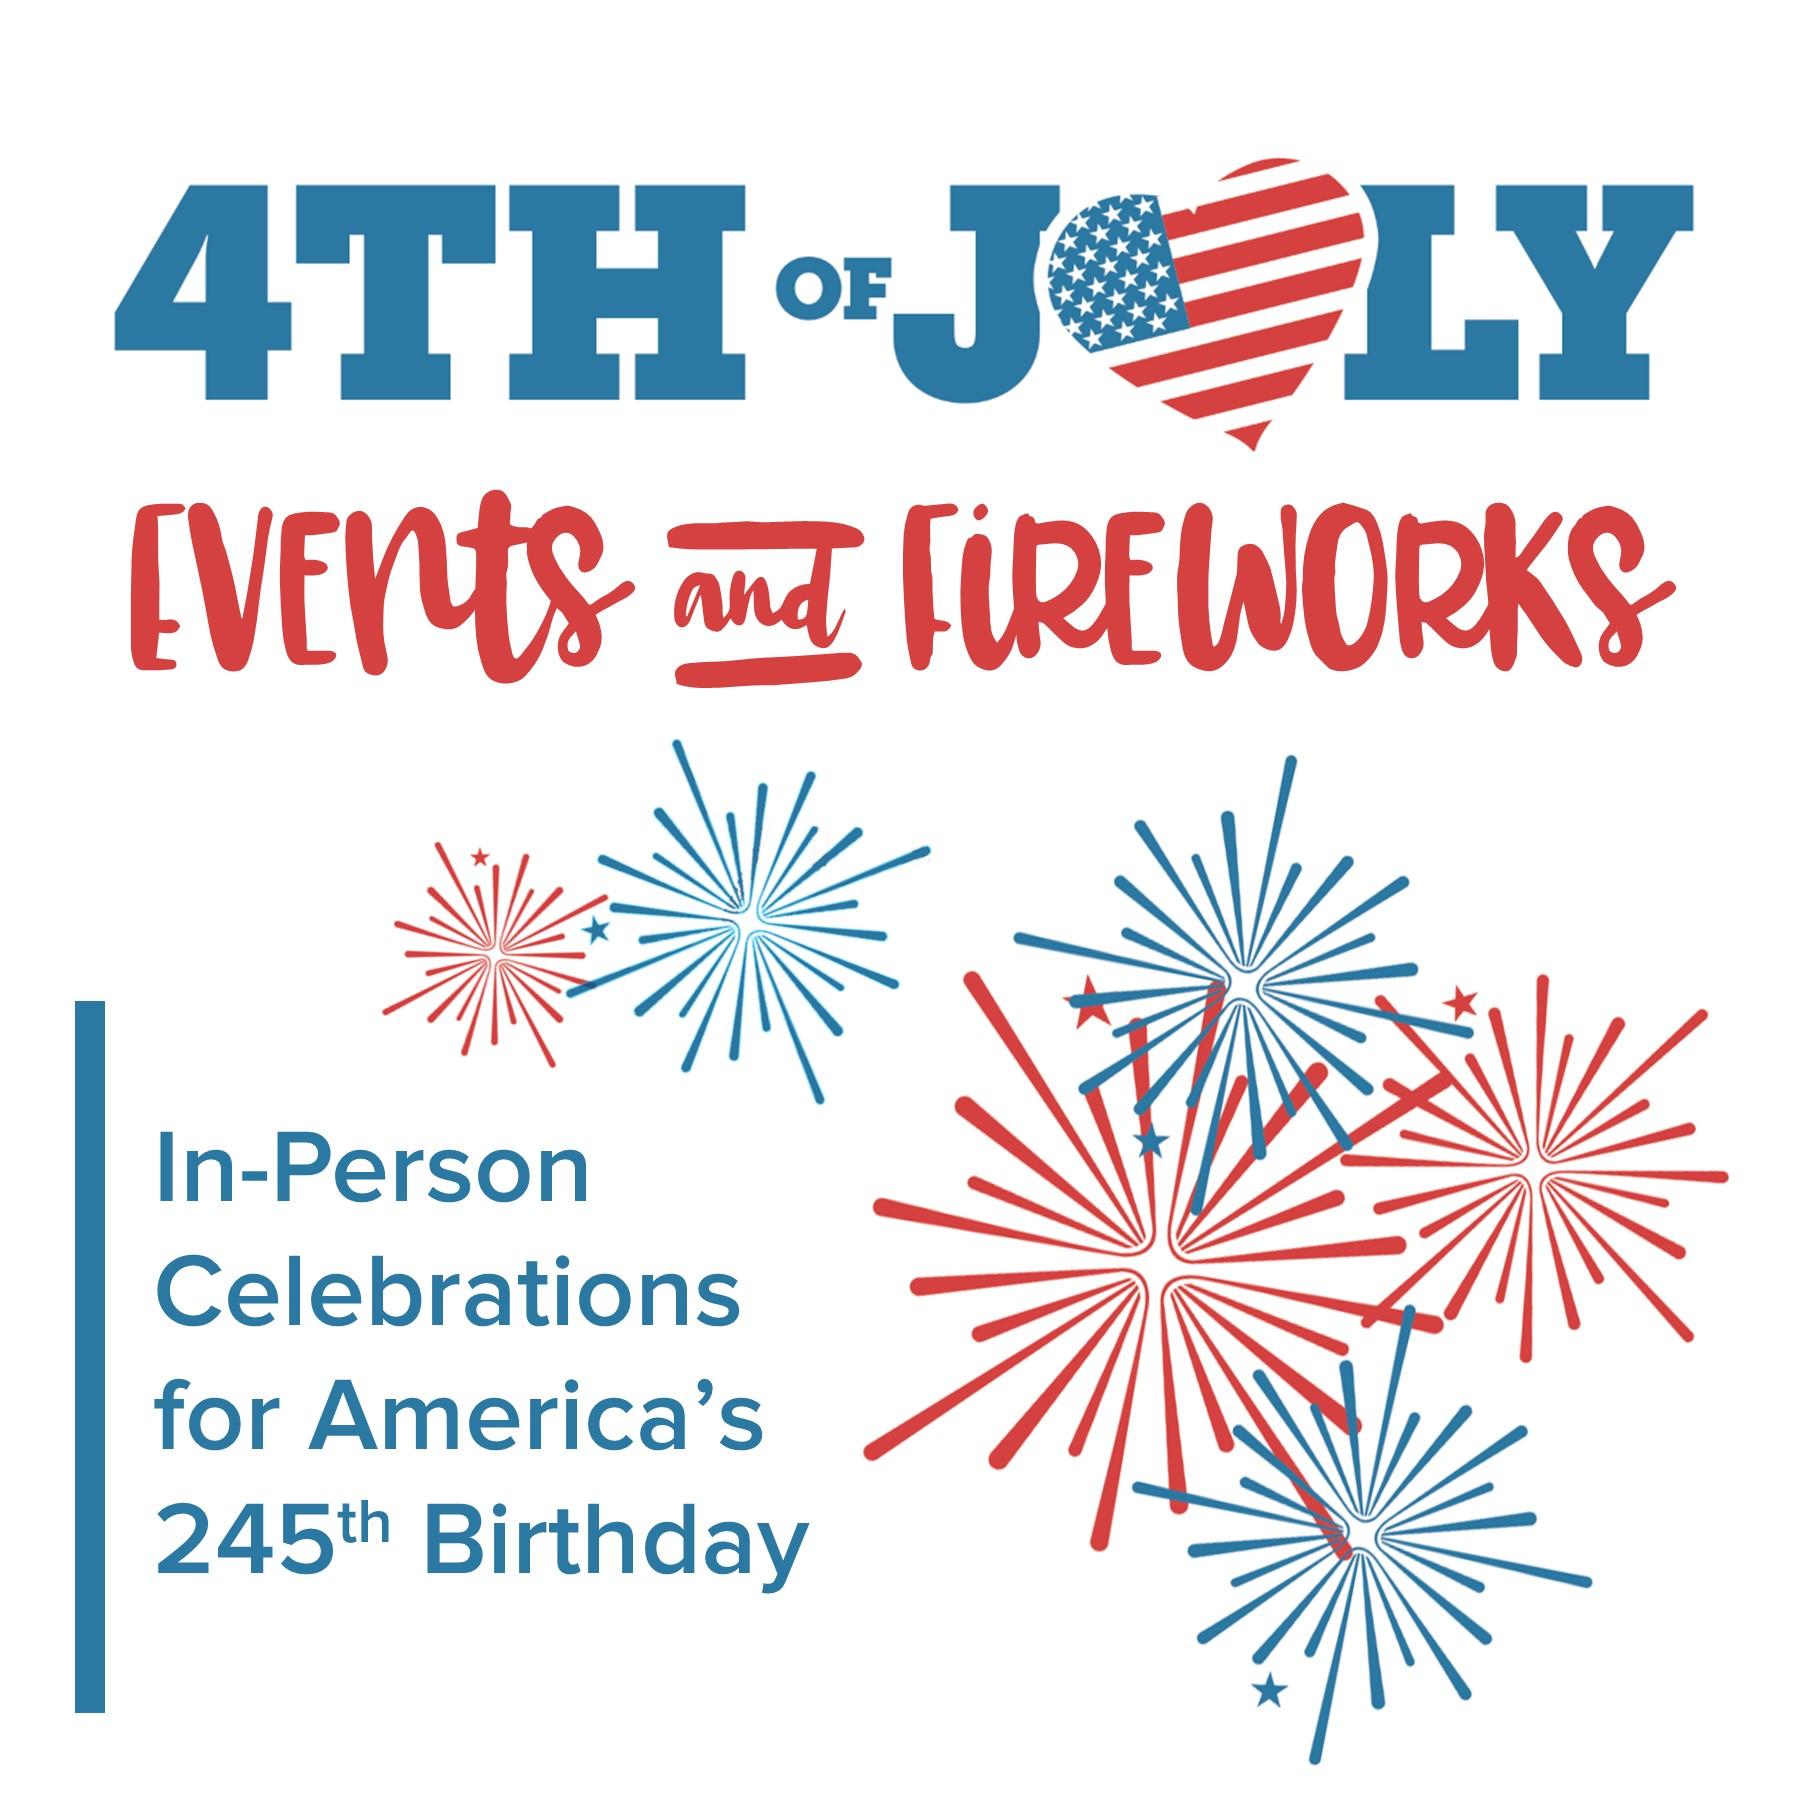 Events Fireworks.jpg